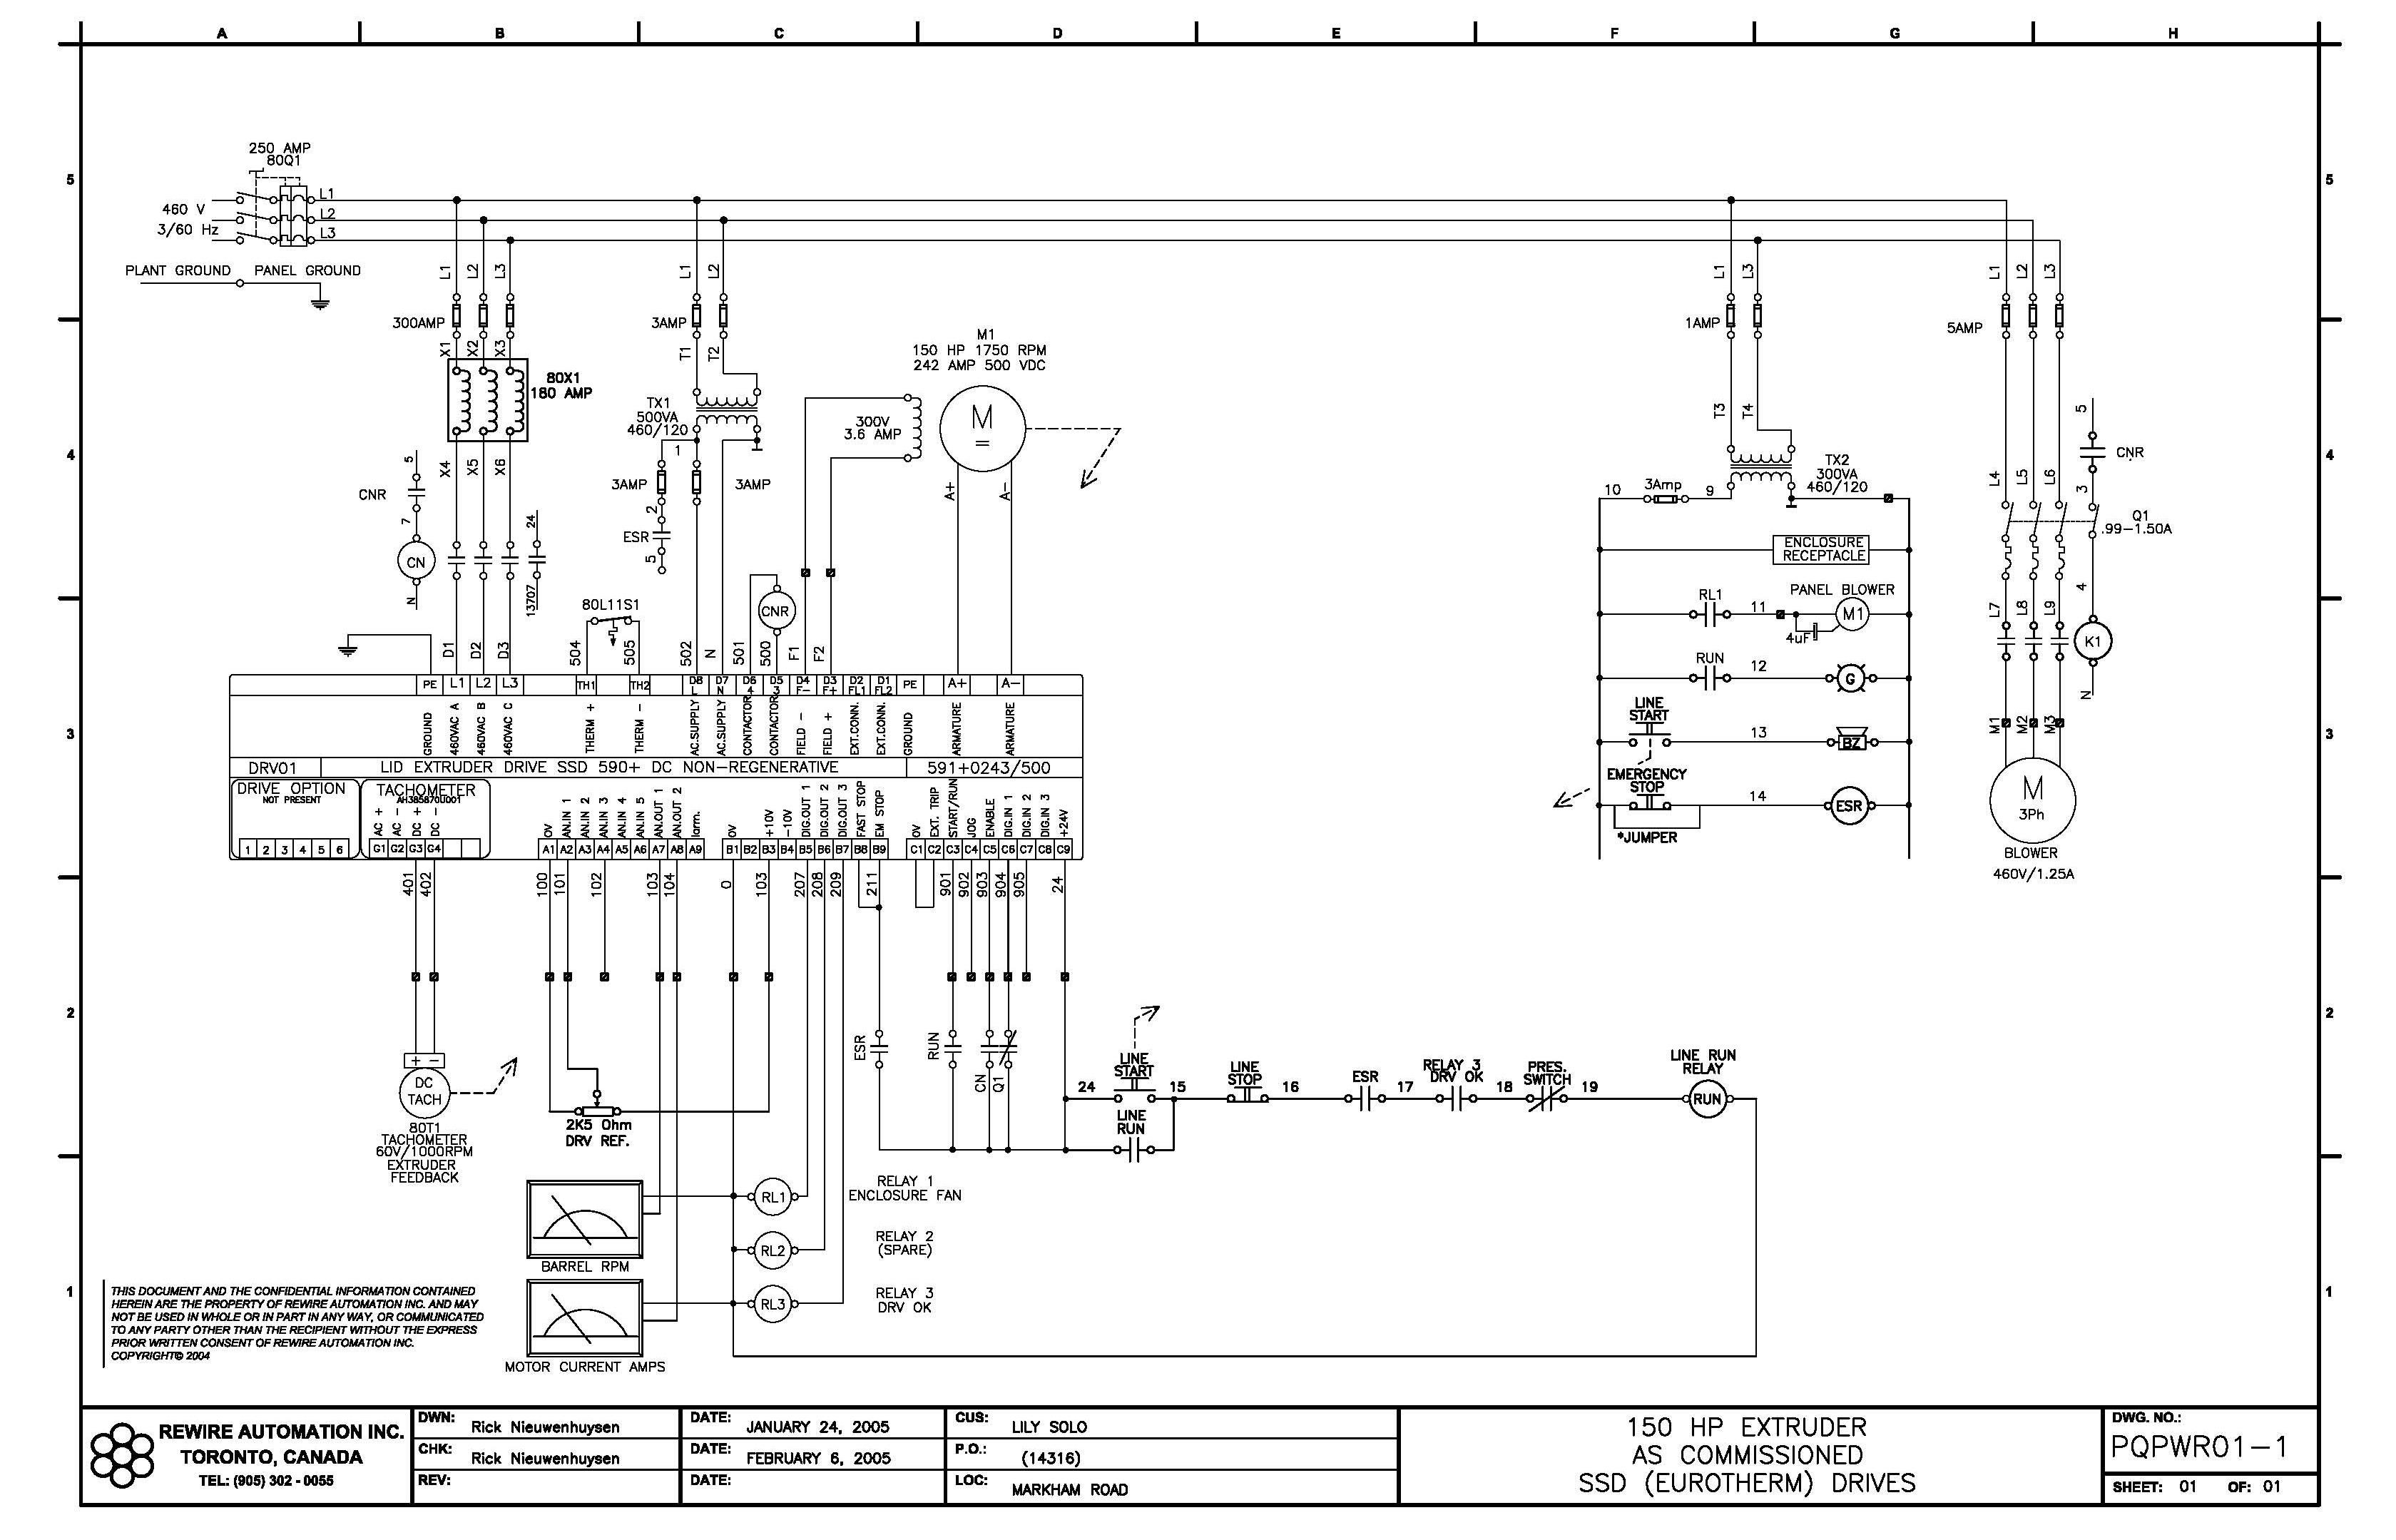 Rewire Automation Inc